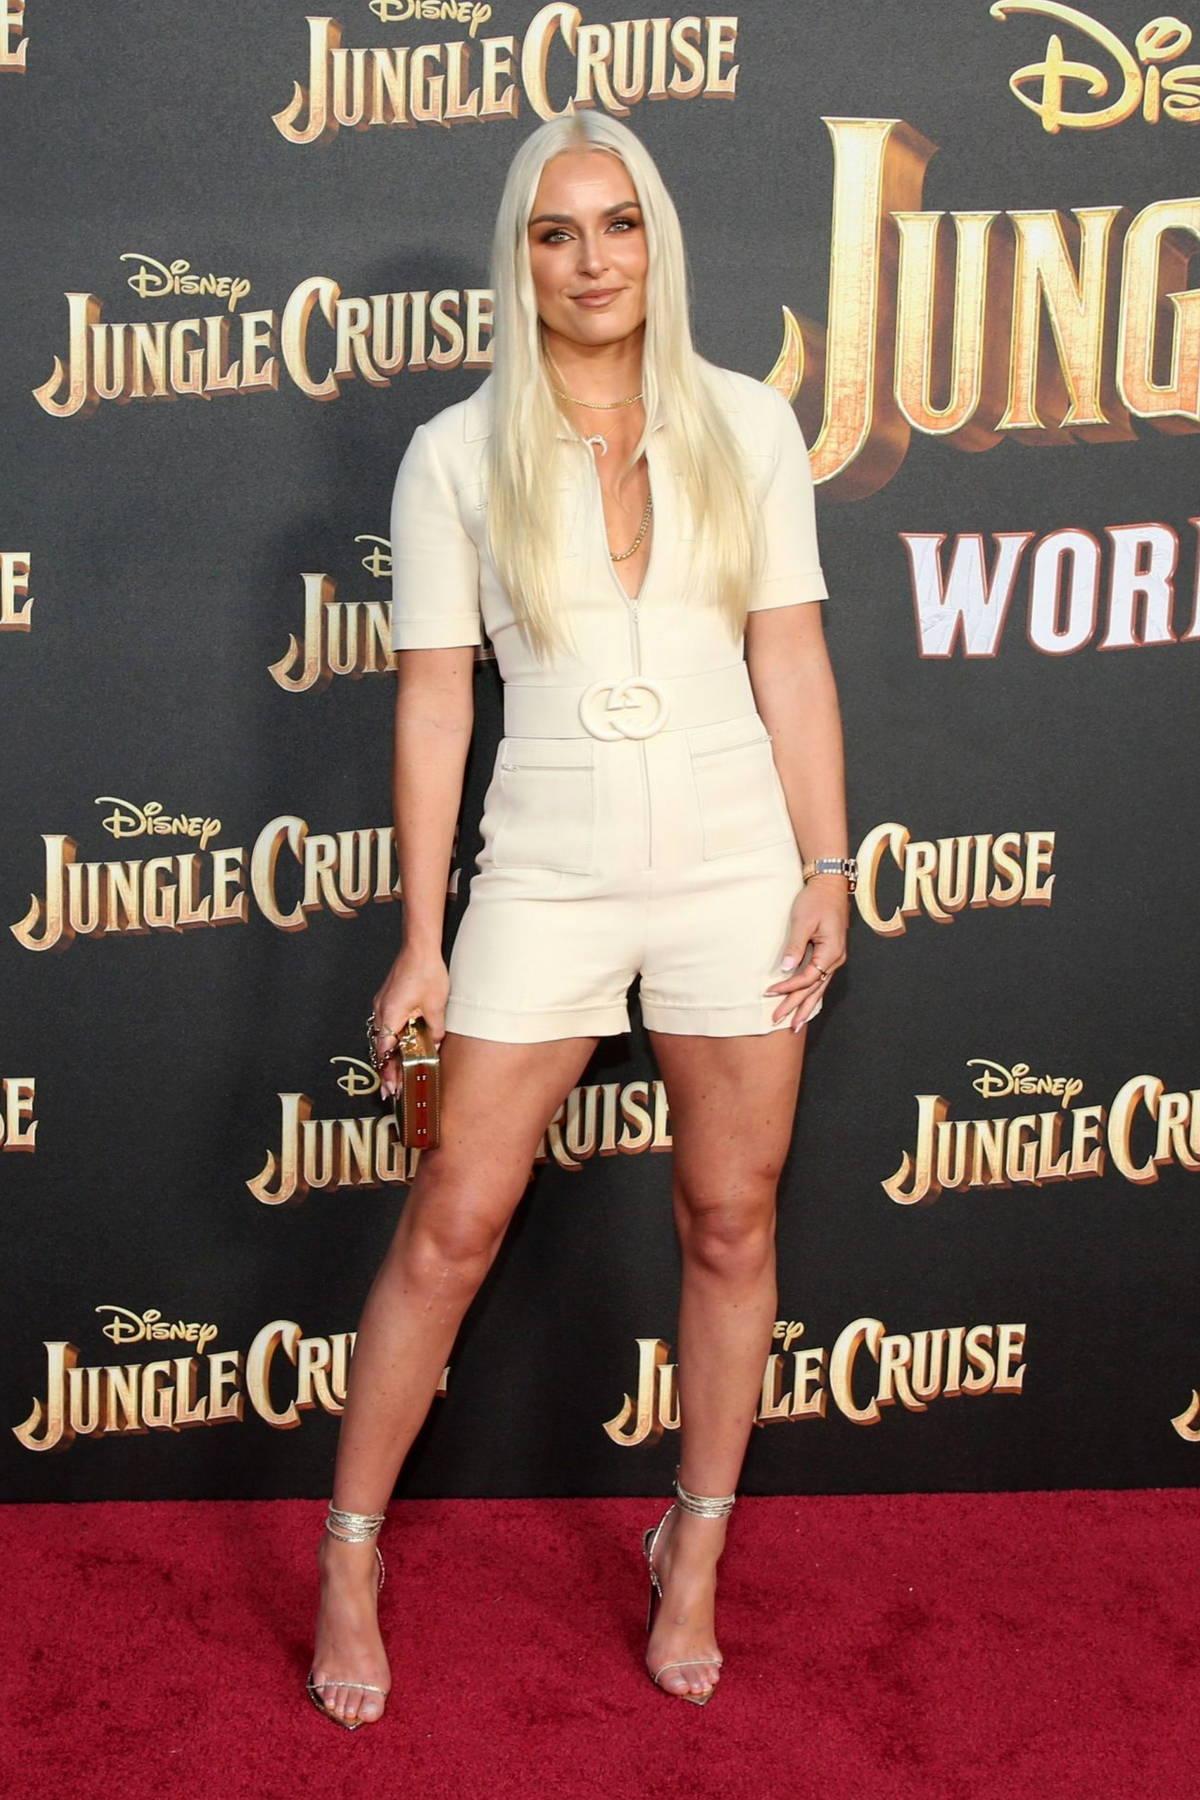 Lindsey Vonn attends the World Premiere Of Disney's 'Jungle Cruise' at Disneyland in Anaheim, California